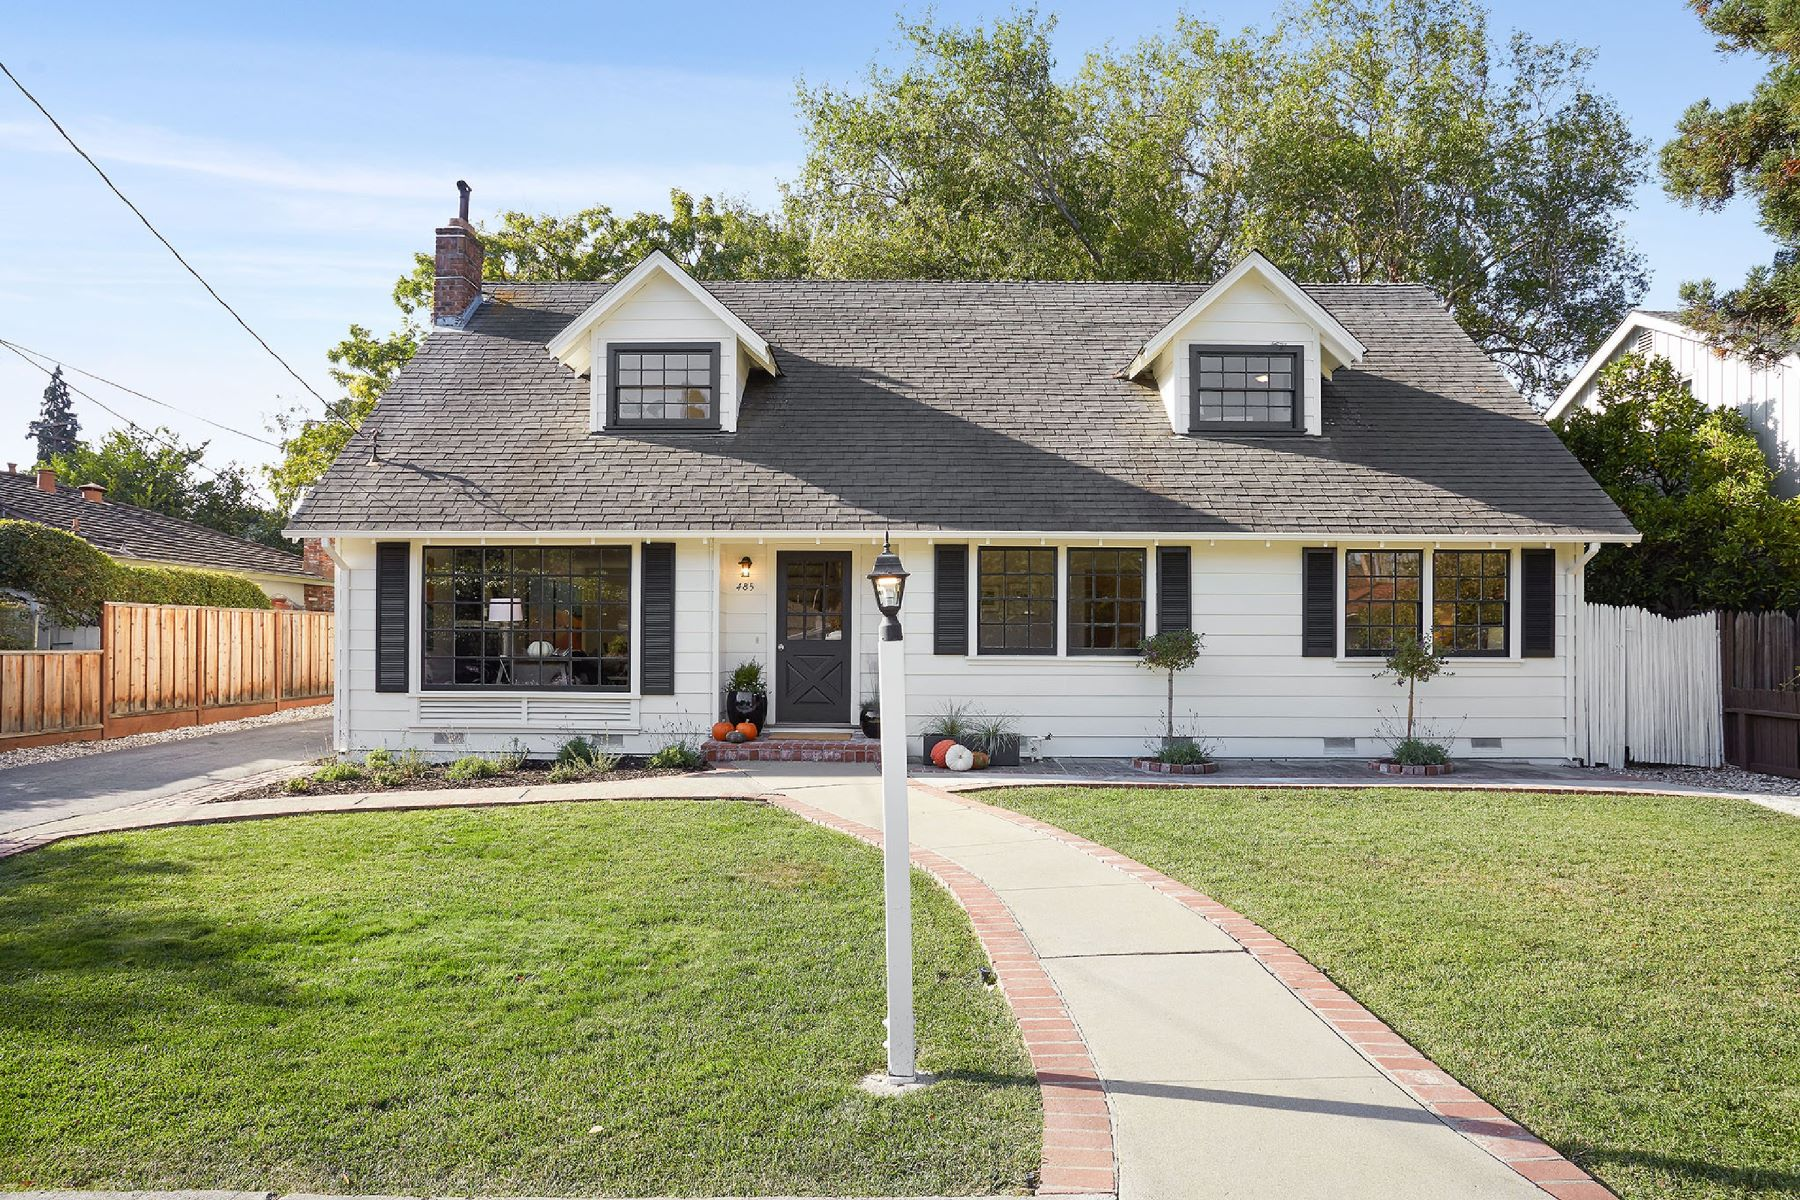 Single Family Homes for Sale at Prime West Menlo Park Cape Cod 485 Arbor Road Menlo Park, California 94025 United States